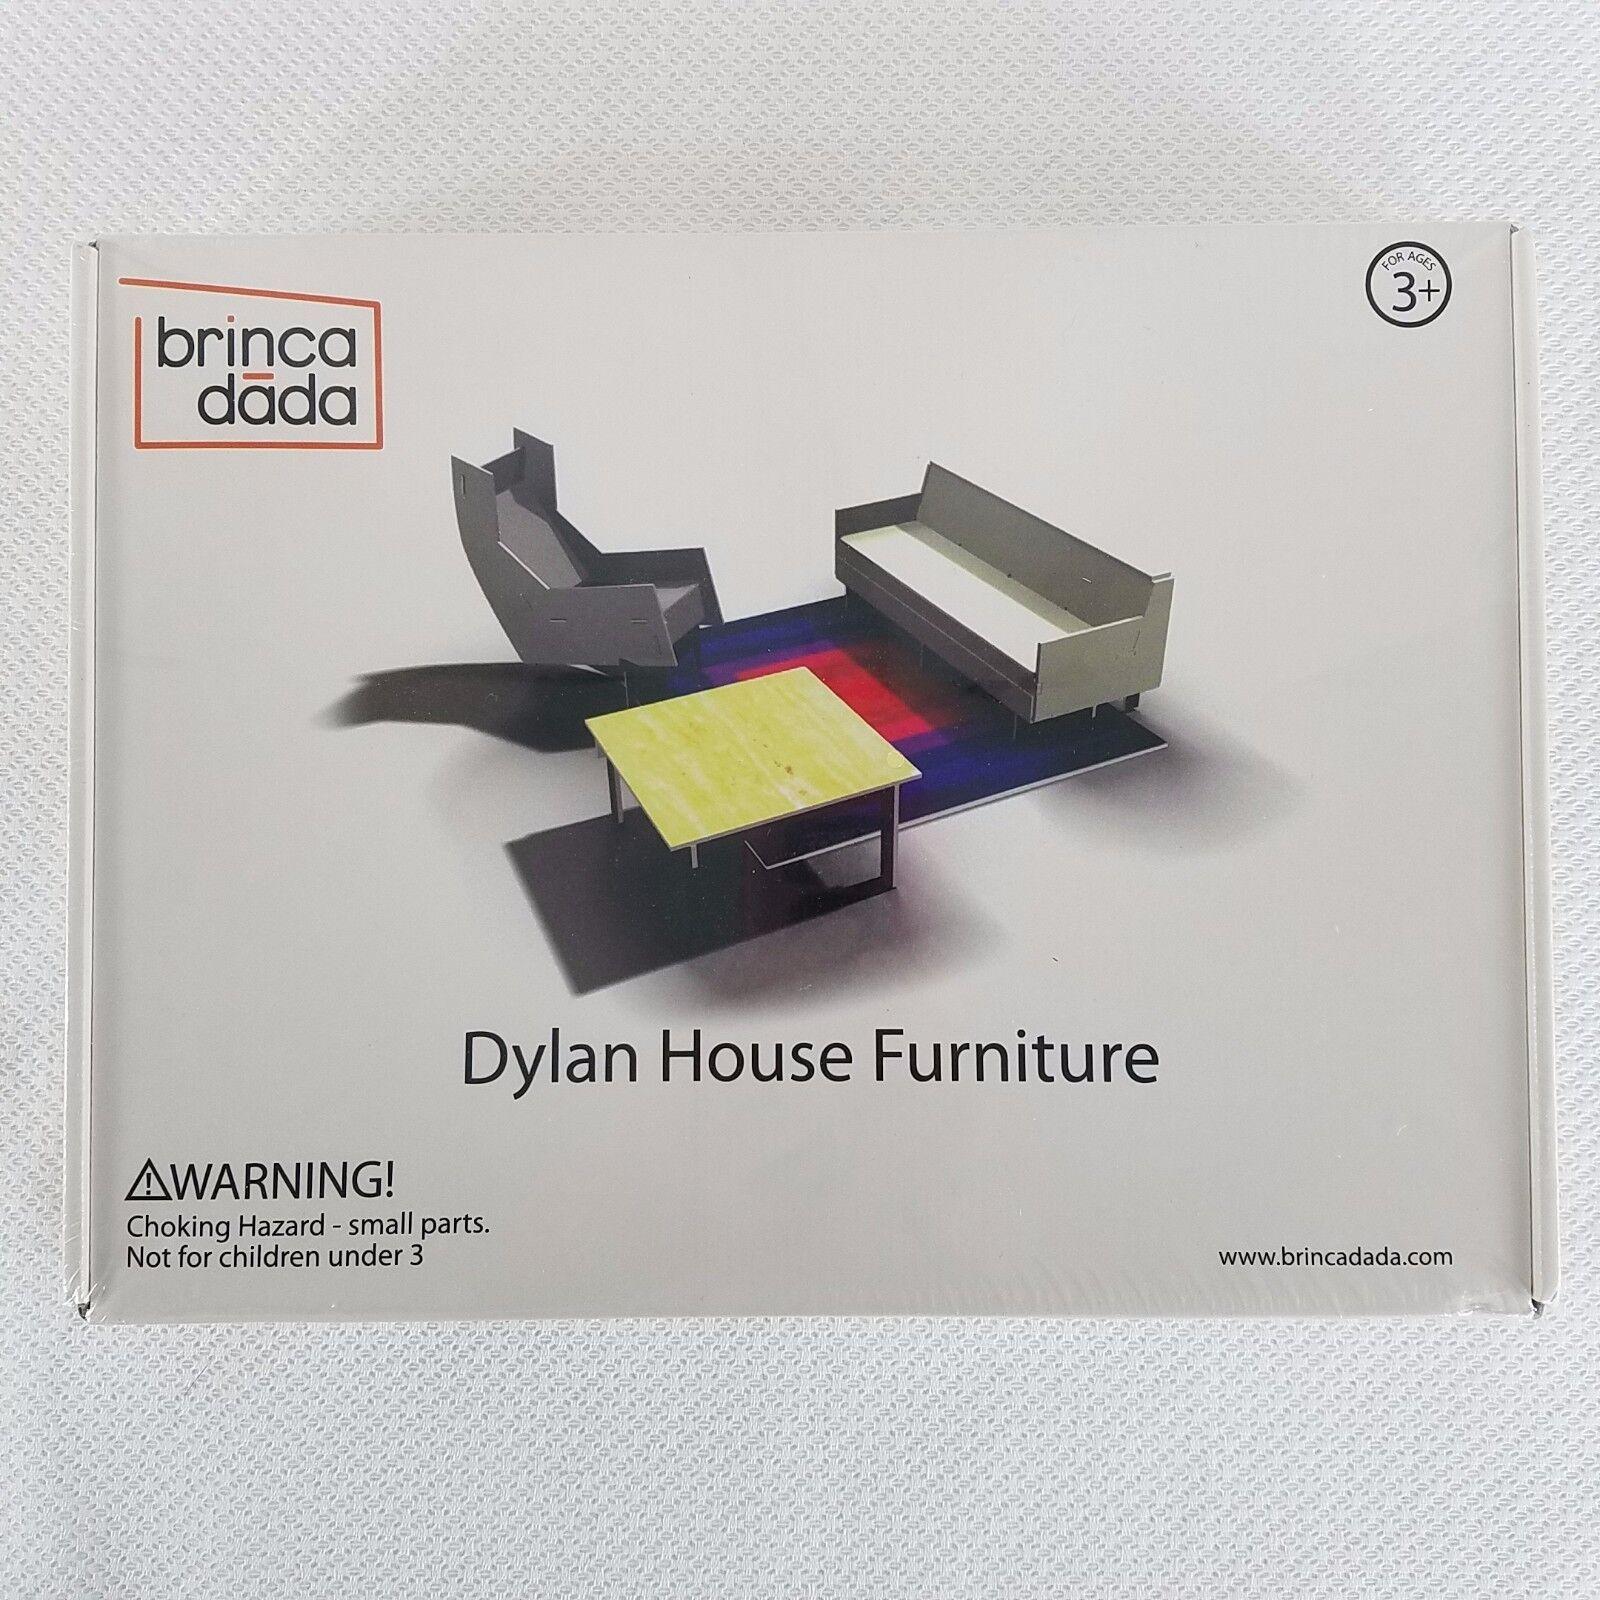 Brinca Dada Dylan House Furniture Foamcore Dollhouse Minature